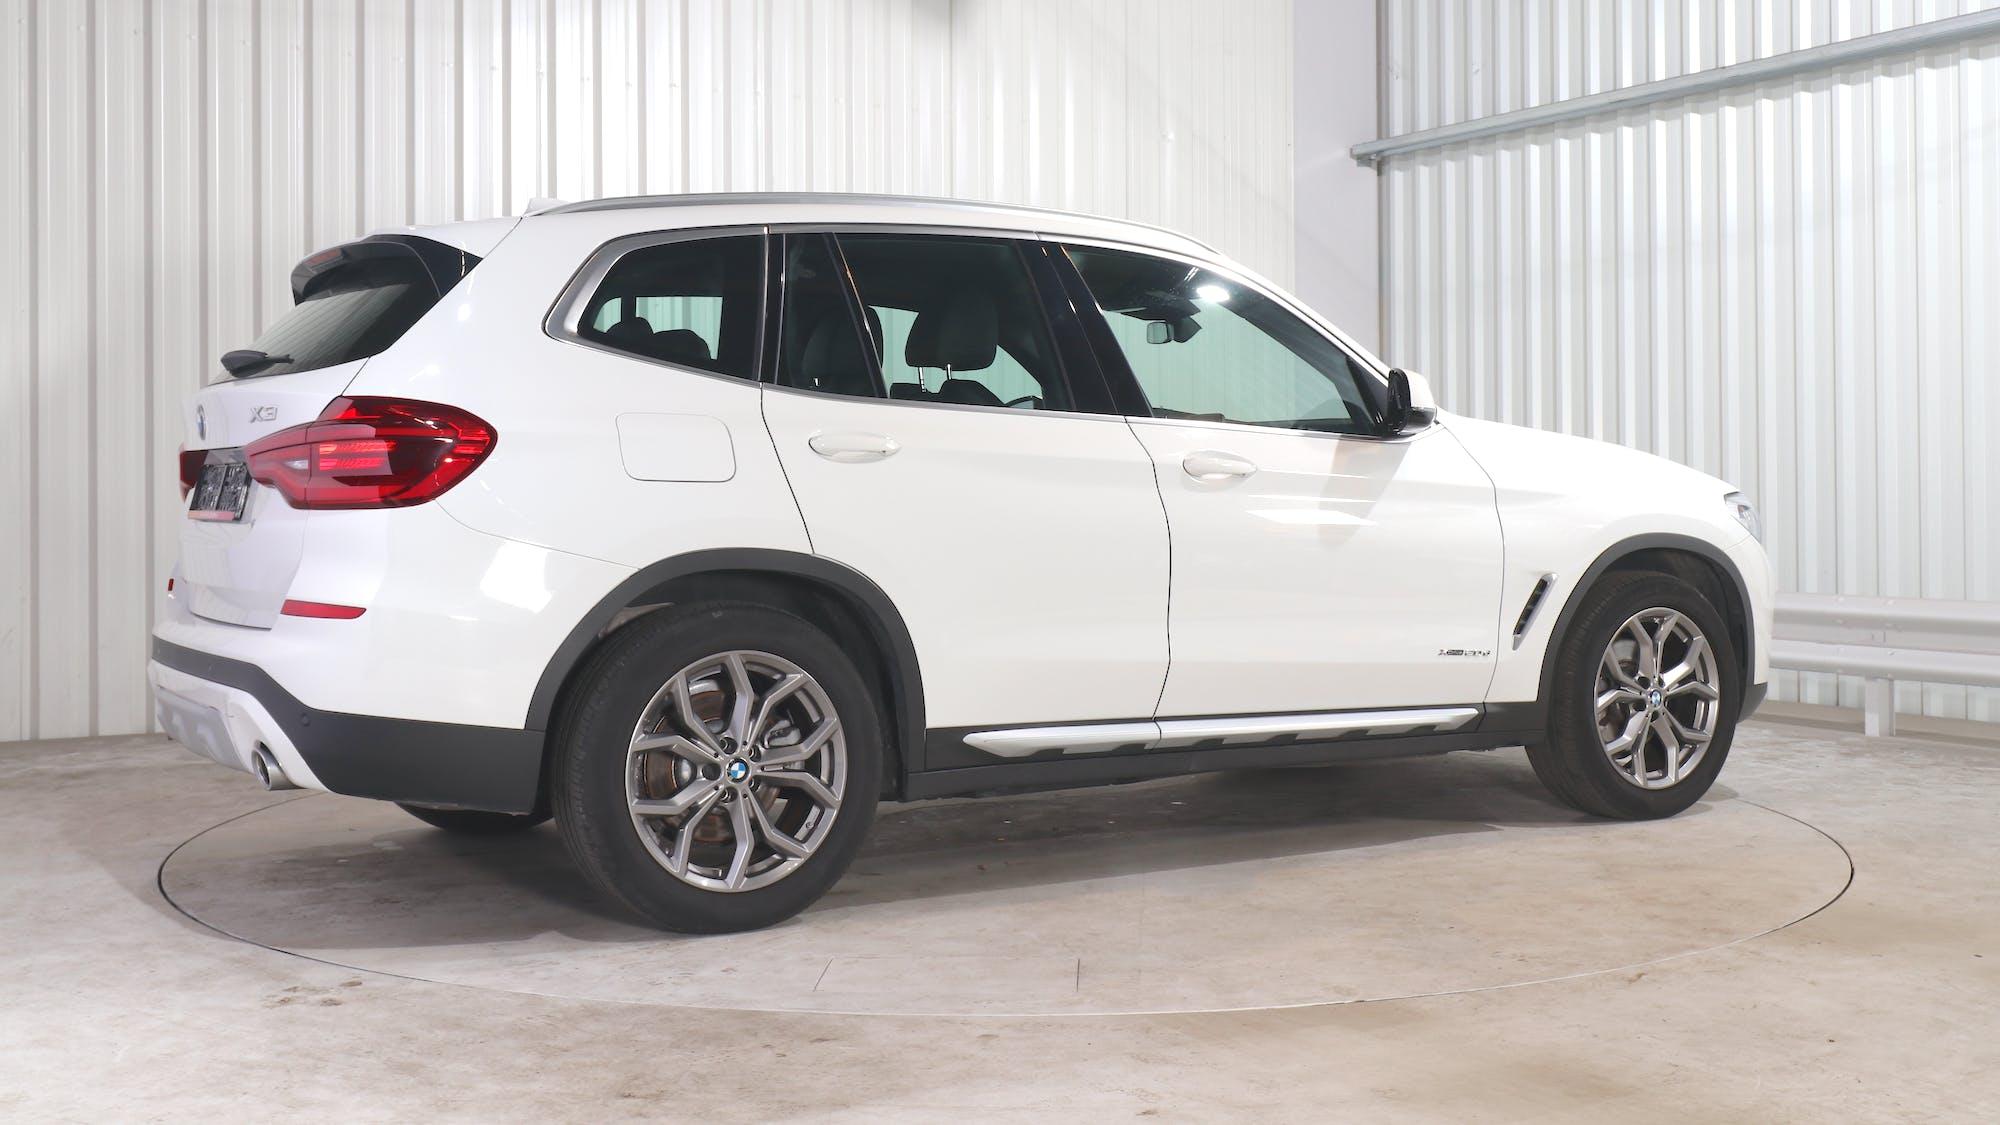 BMW X3 leasing exterior 7